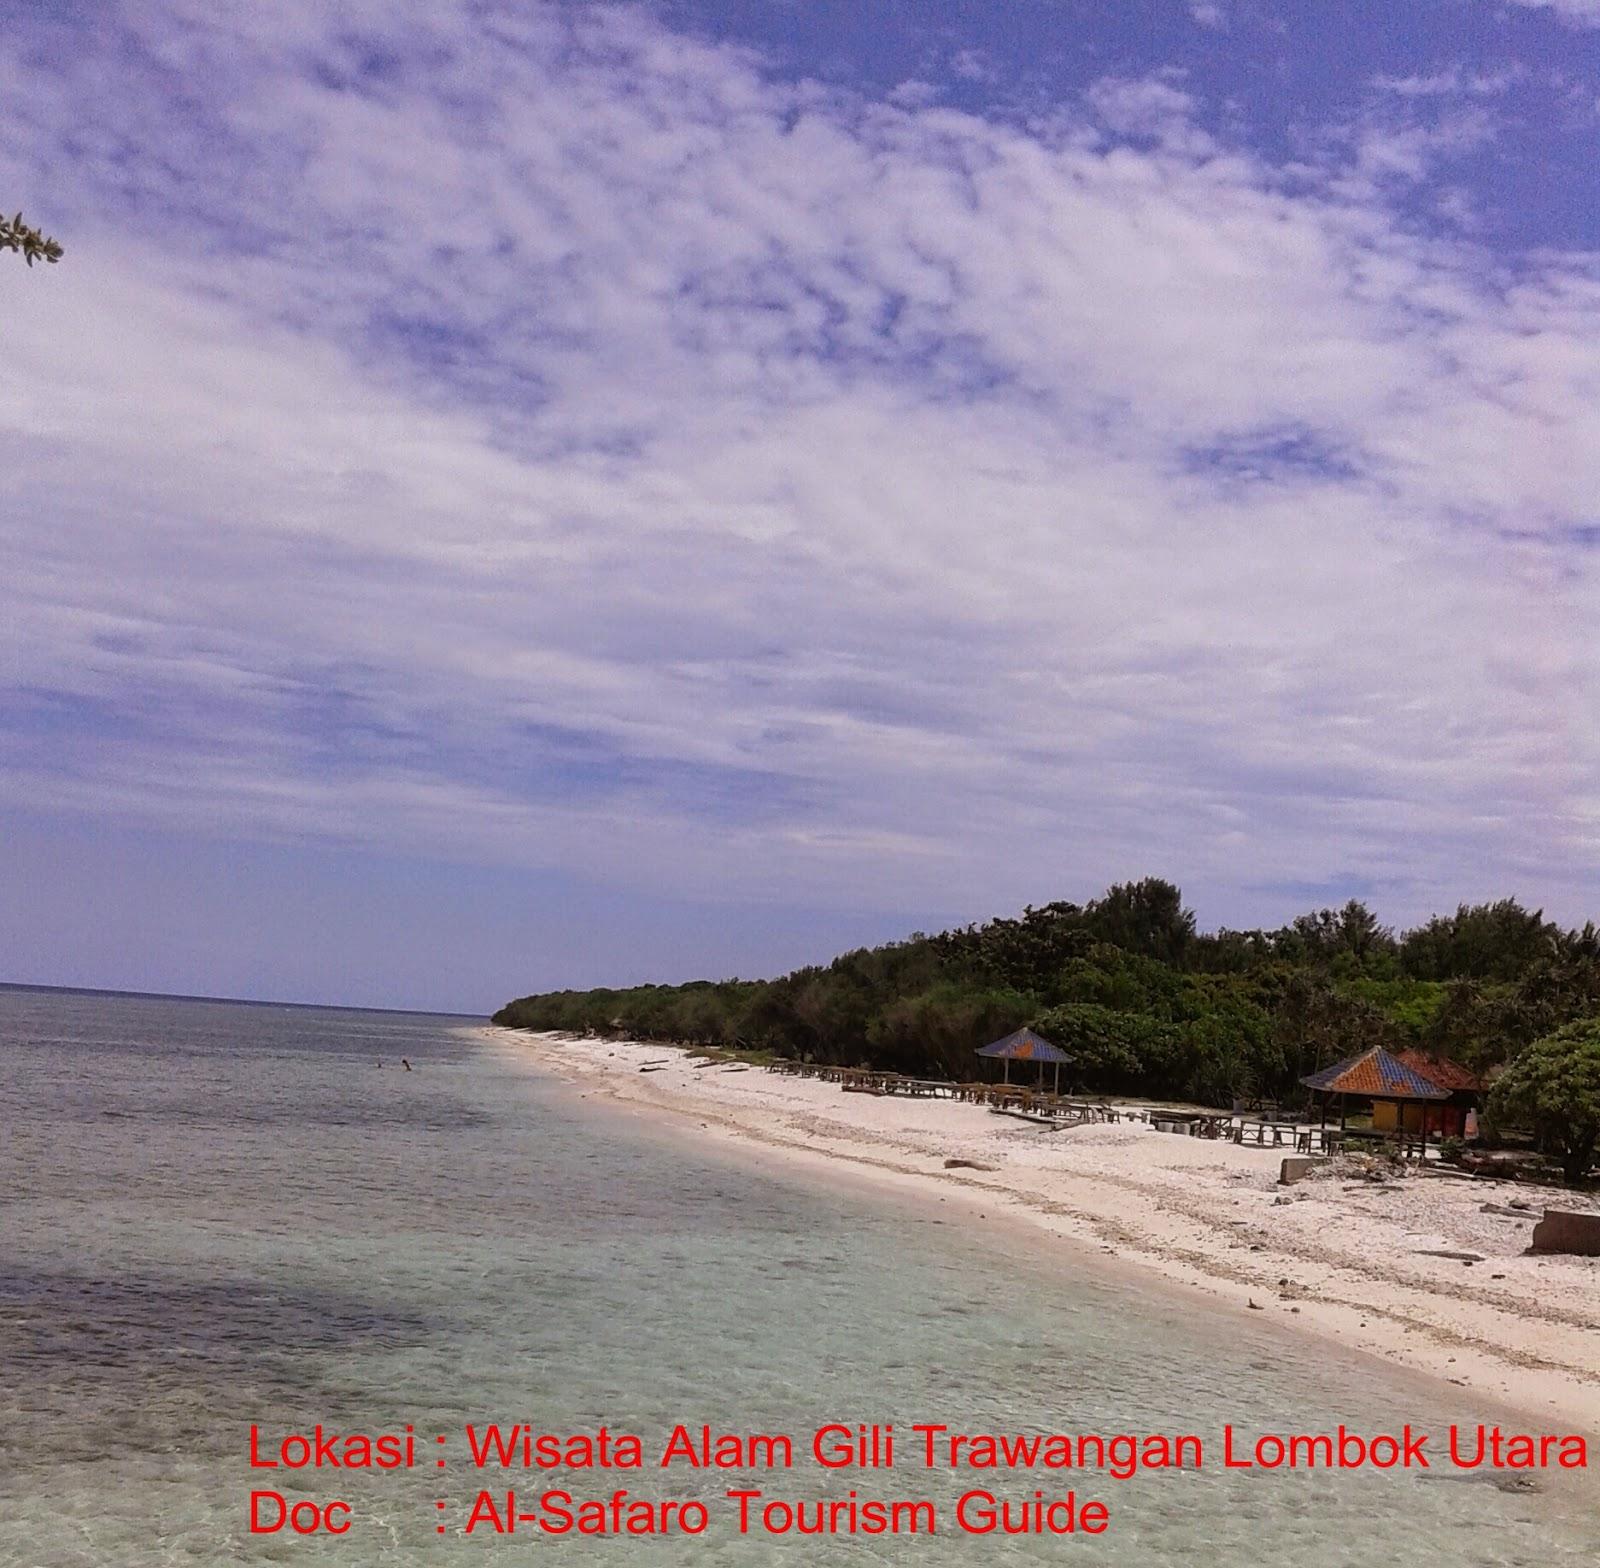 Al Safaro Tourism Guides 20140319 104518 1 Jpg Pulau Gili